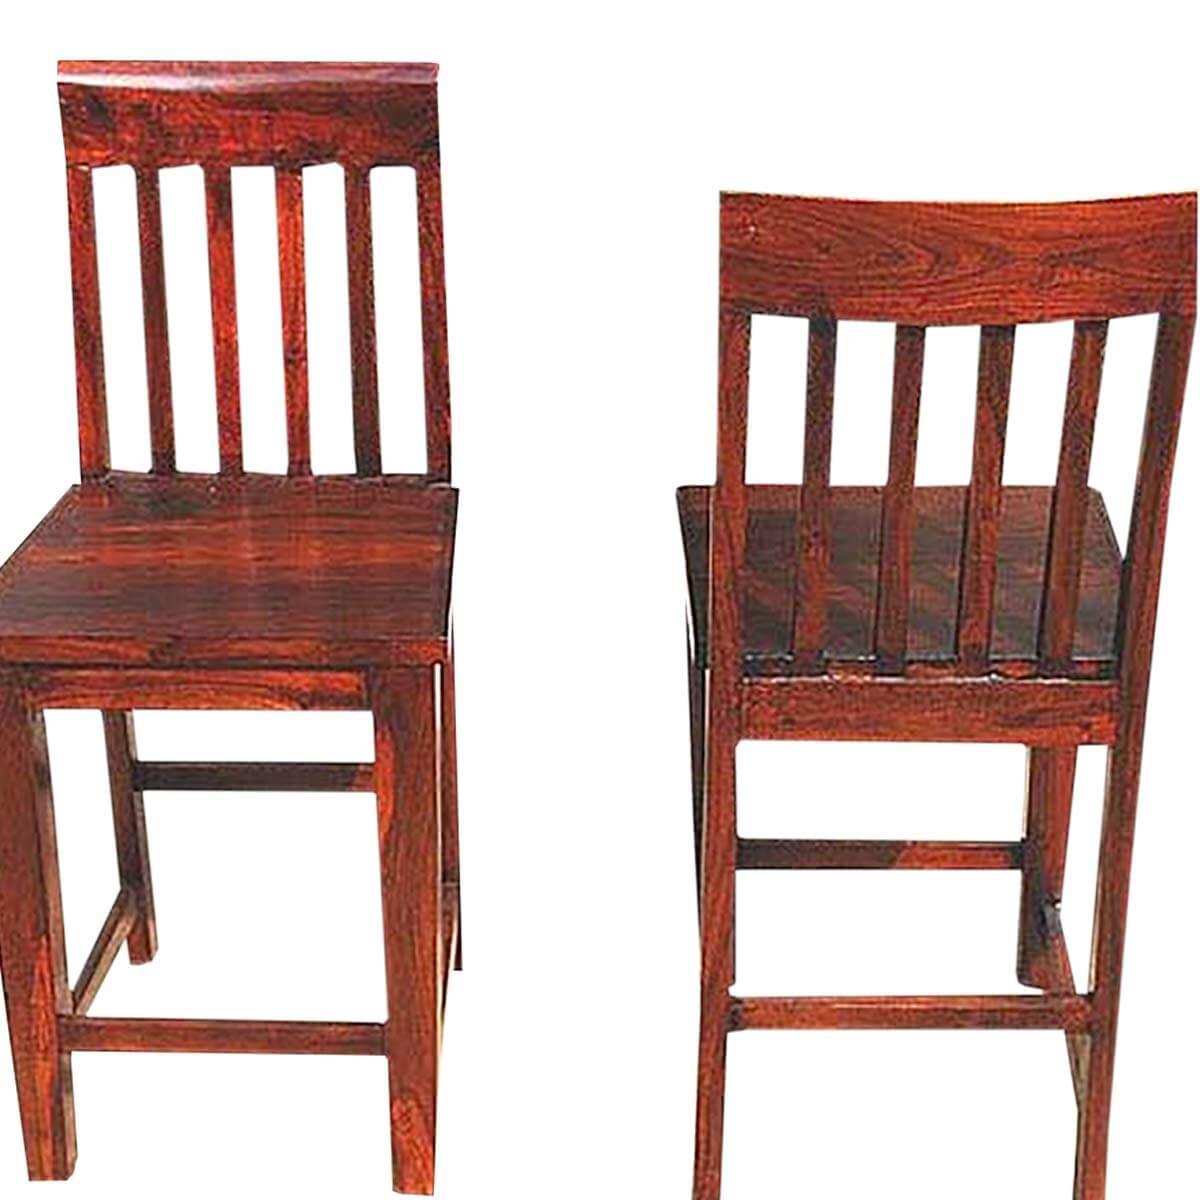 pub dining room table sets | Sierra Nevada 5 pc Pub Table Bar Dining Room Table and ...